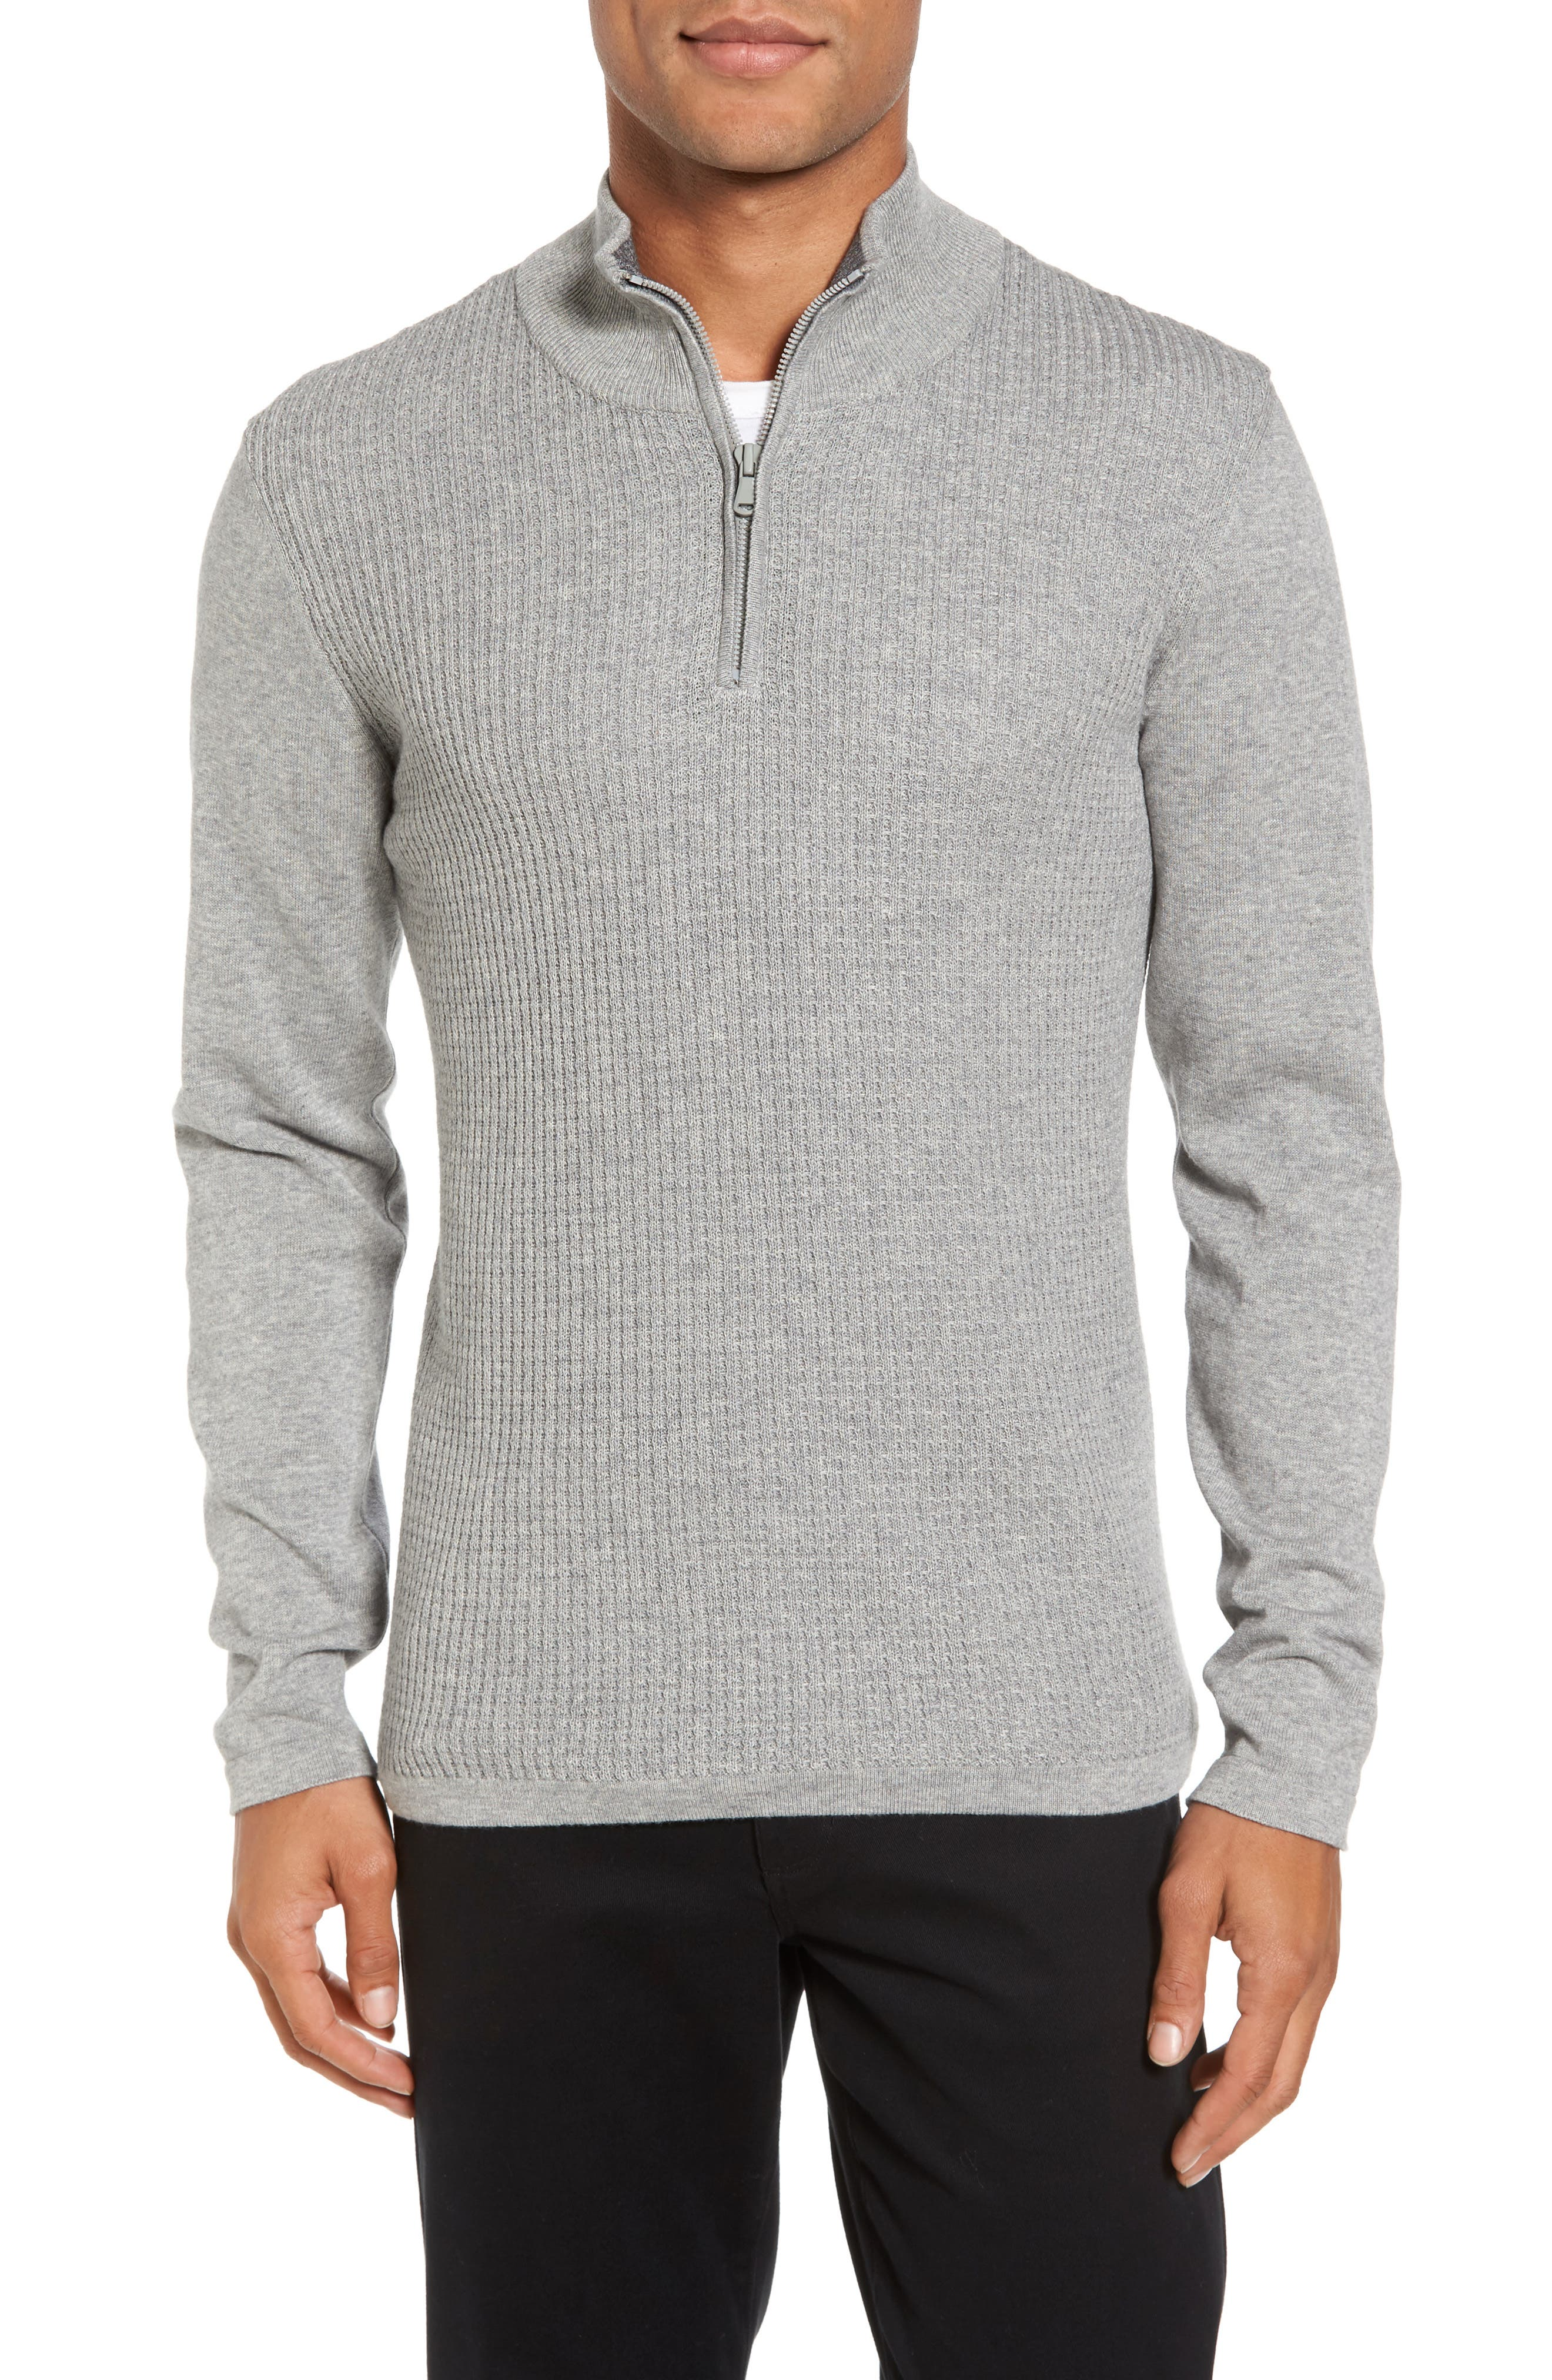 Main Image - Zachary Prell Higgins Quarter Zip Sweater